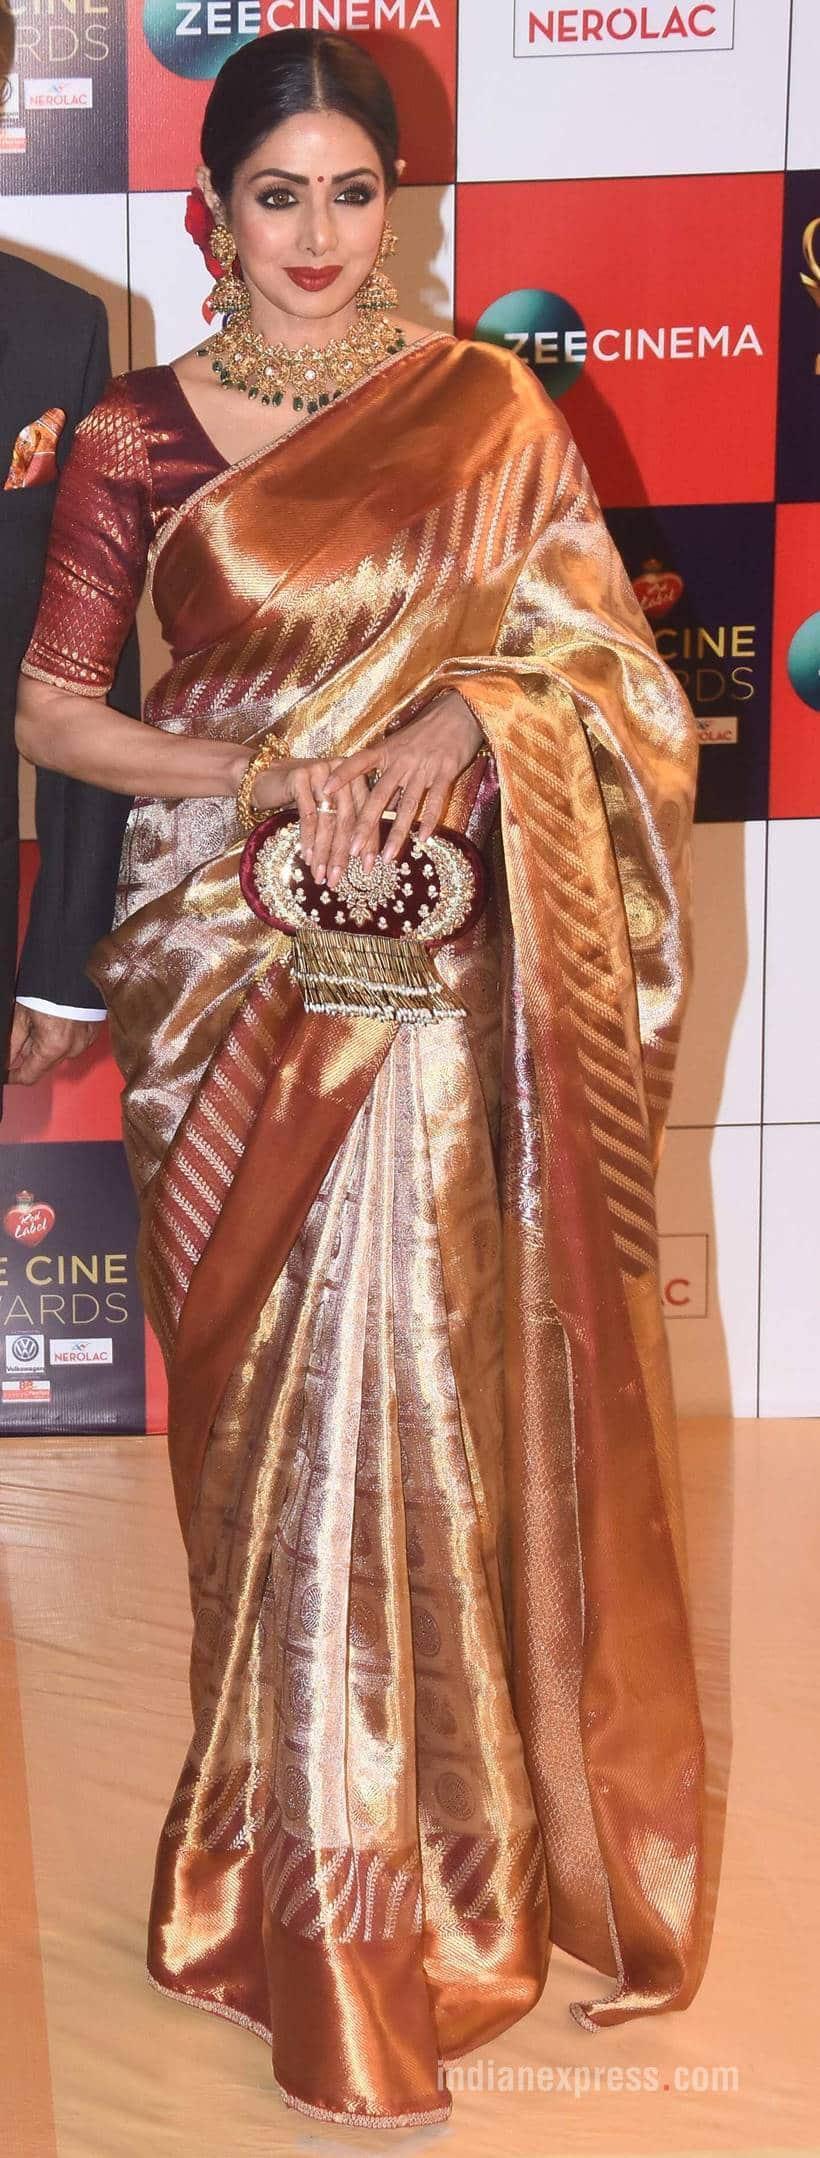 Sridevi, Sridevi latest photos, Sridevi sabyasachi saris, Sridevi fashion, Sridevi ethnic fashion